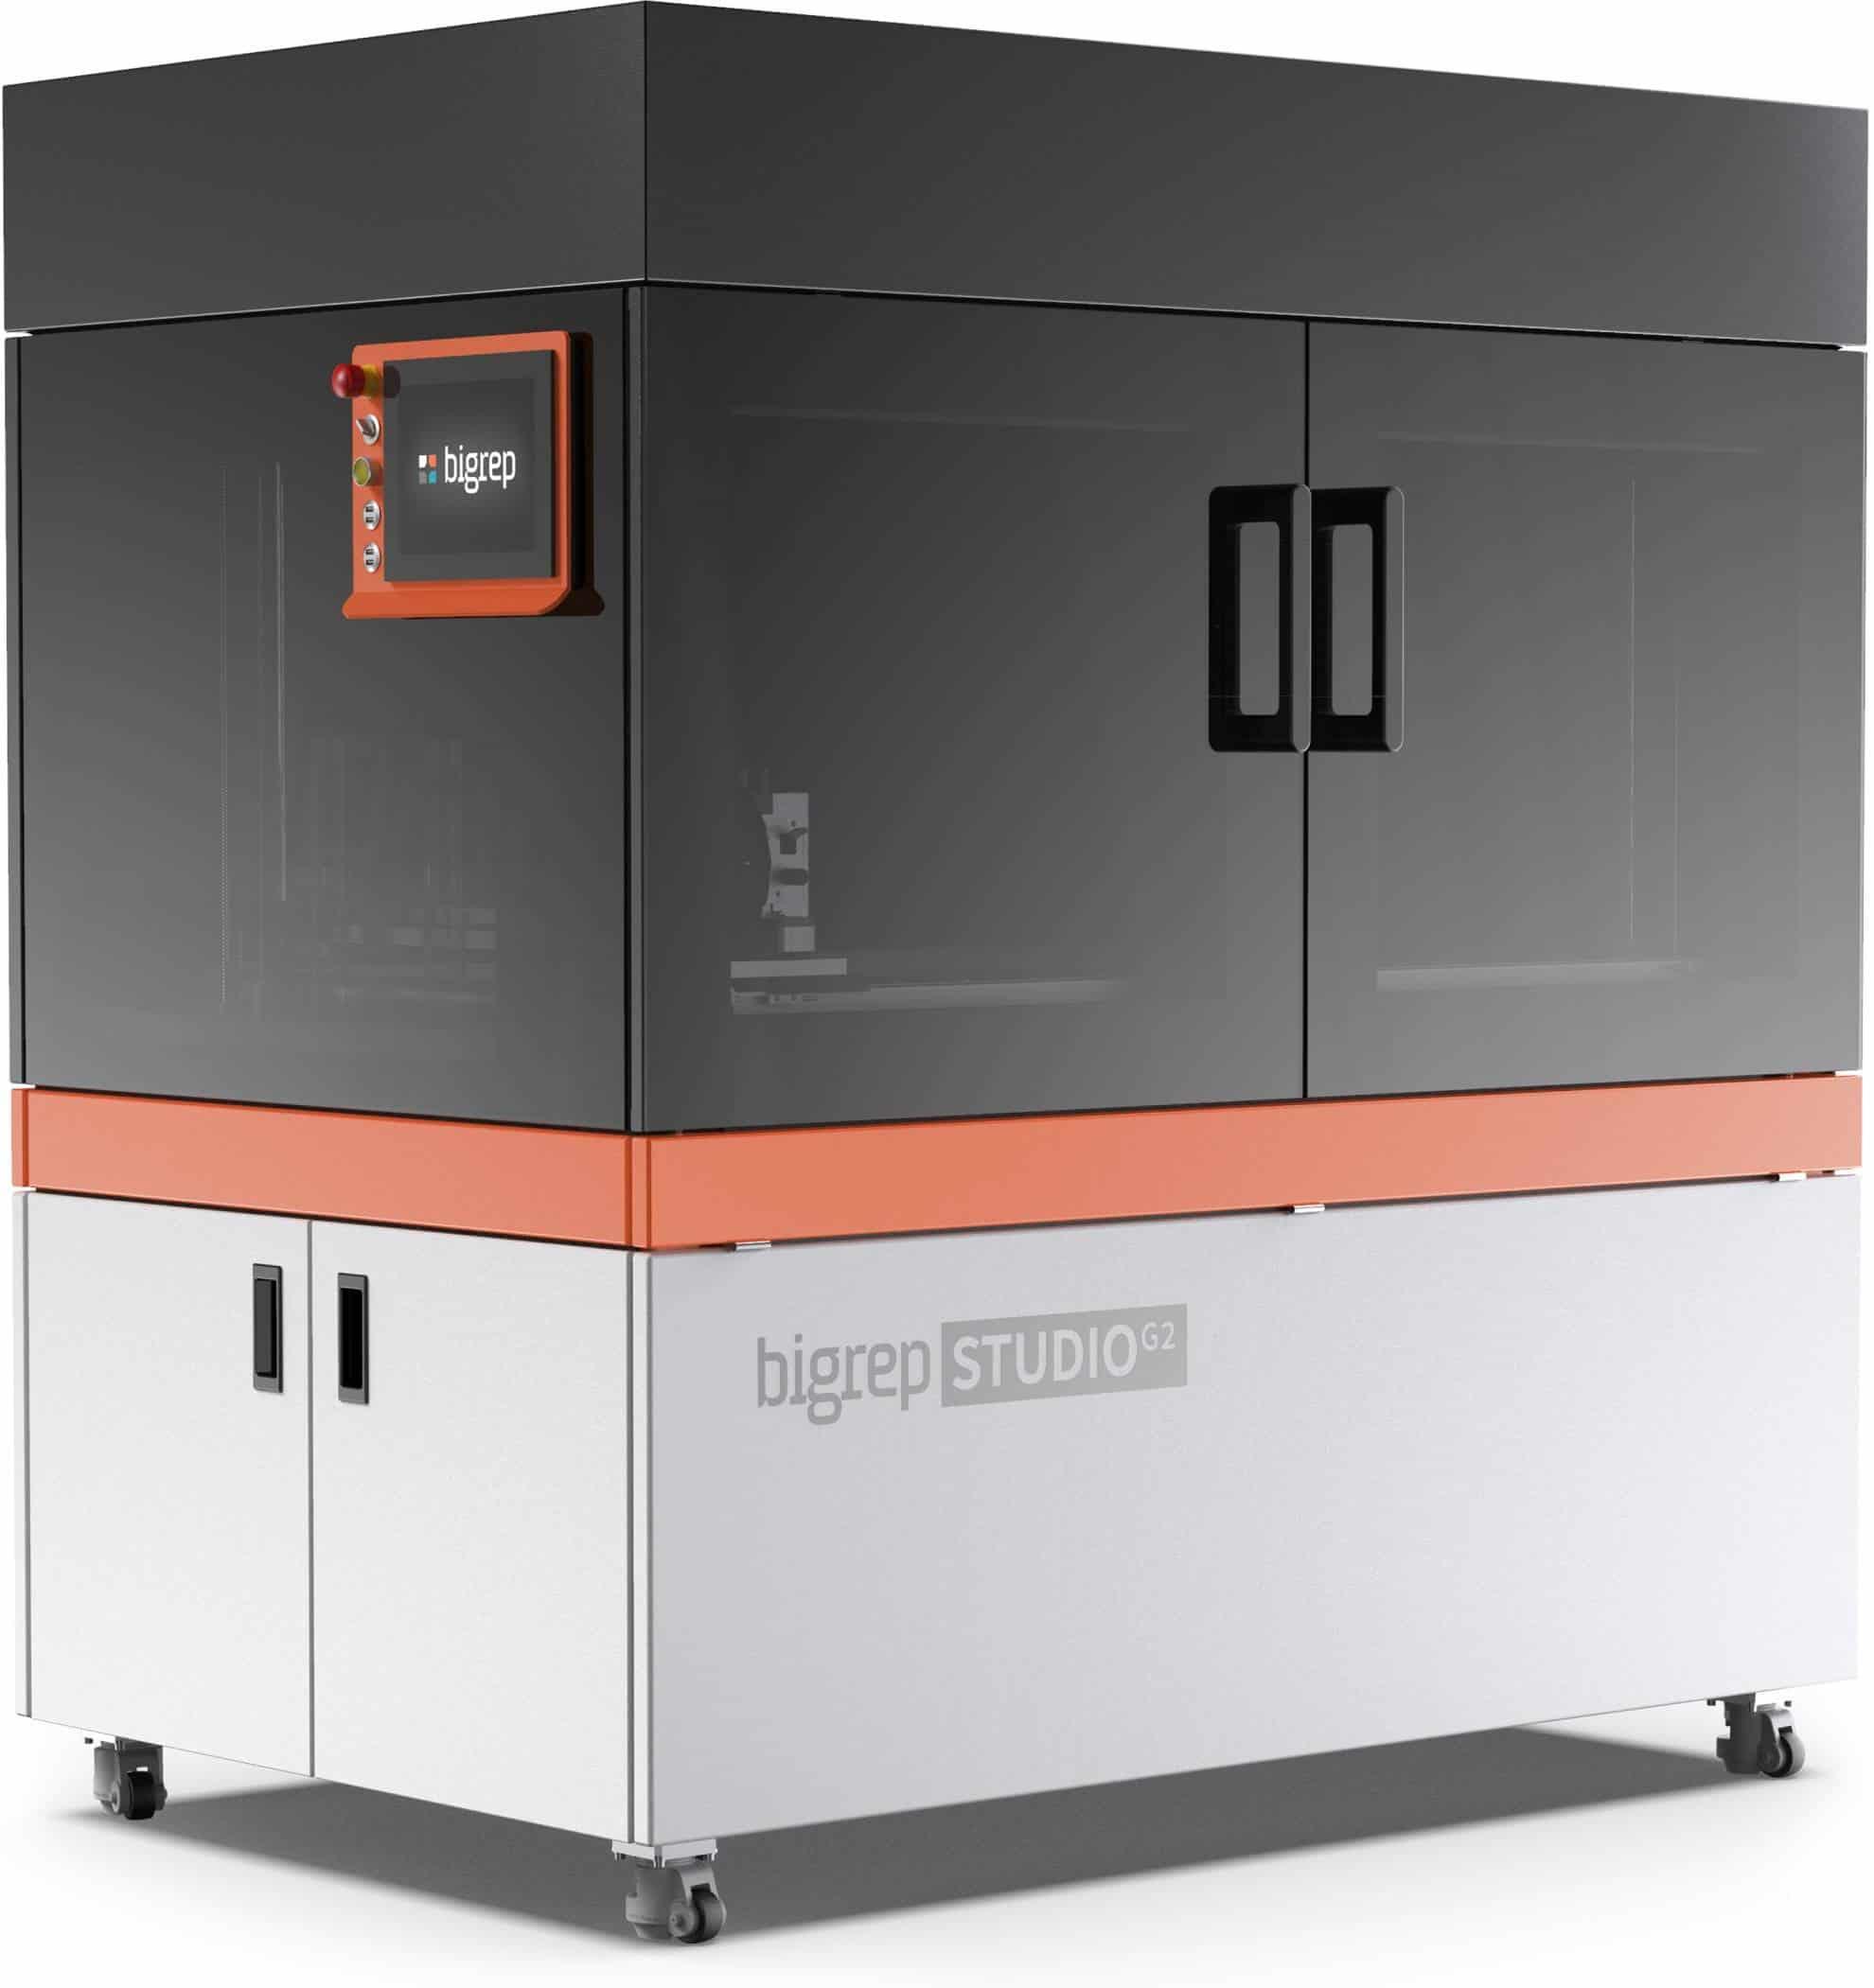 Carbon Fiber Patterns from 3D Prinjter BigRep STUDIO